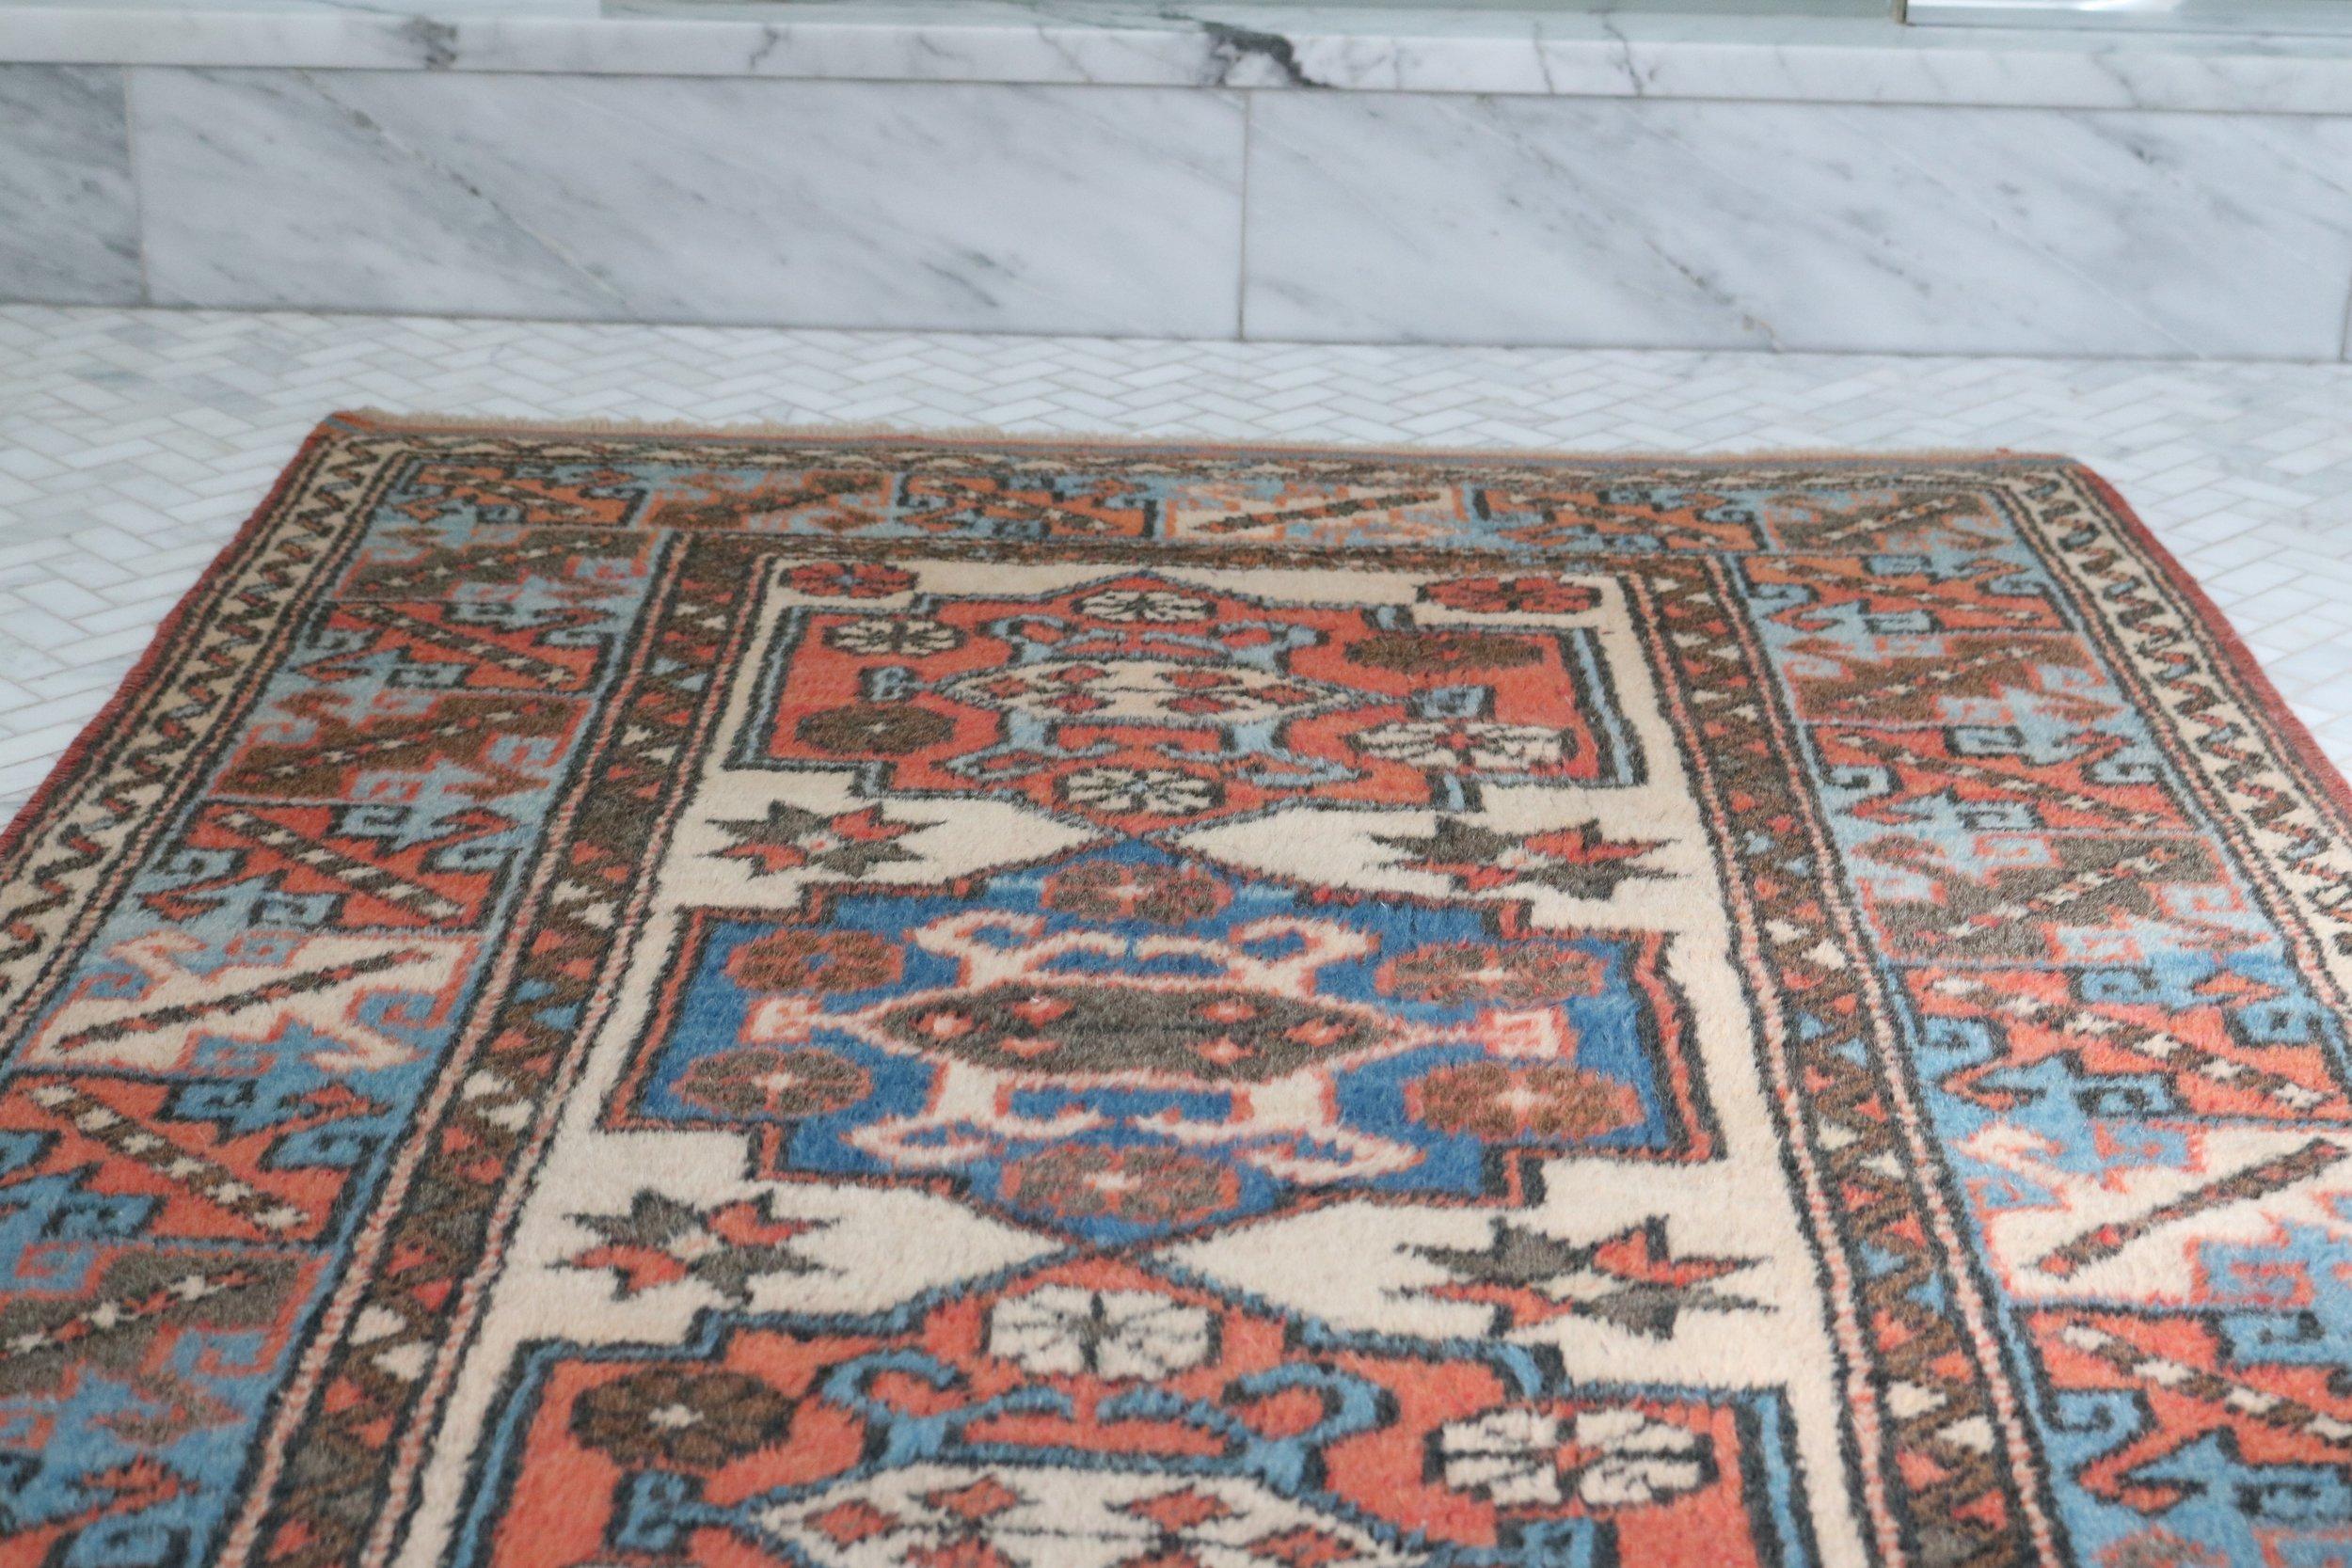 Vintage-Turkish-rug-detail